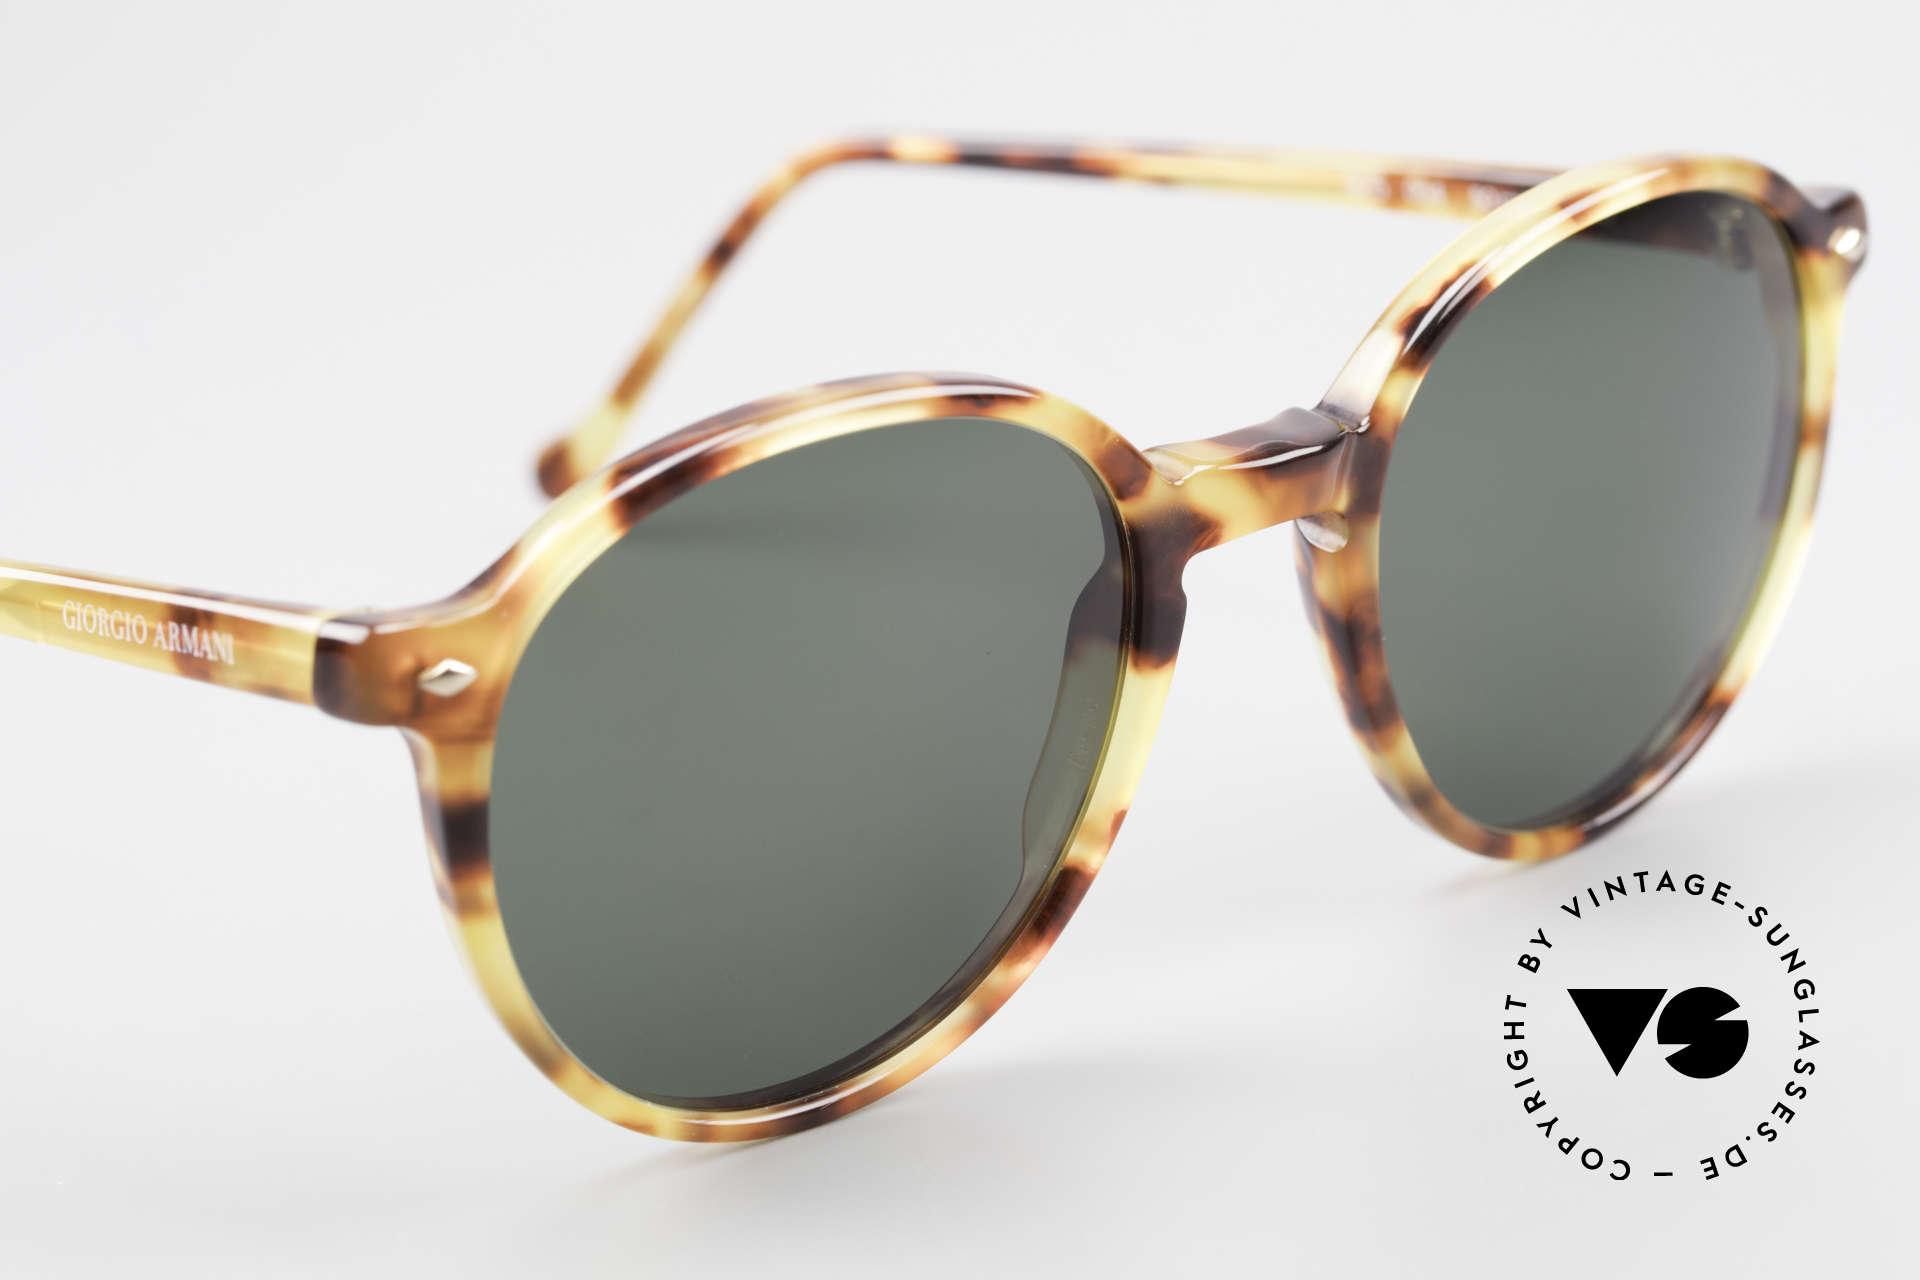 Giorgio Armani 325 Old Panto 90's Sunglasses, NO RETRO specs, but a unique 25 years old ORIGINAL, Made for Men and Women